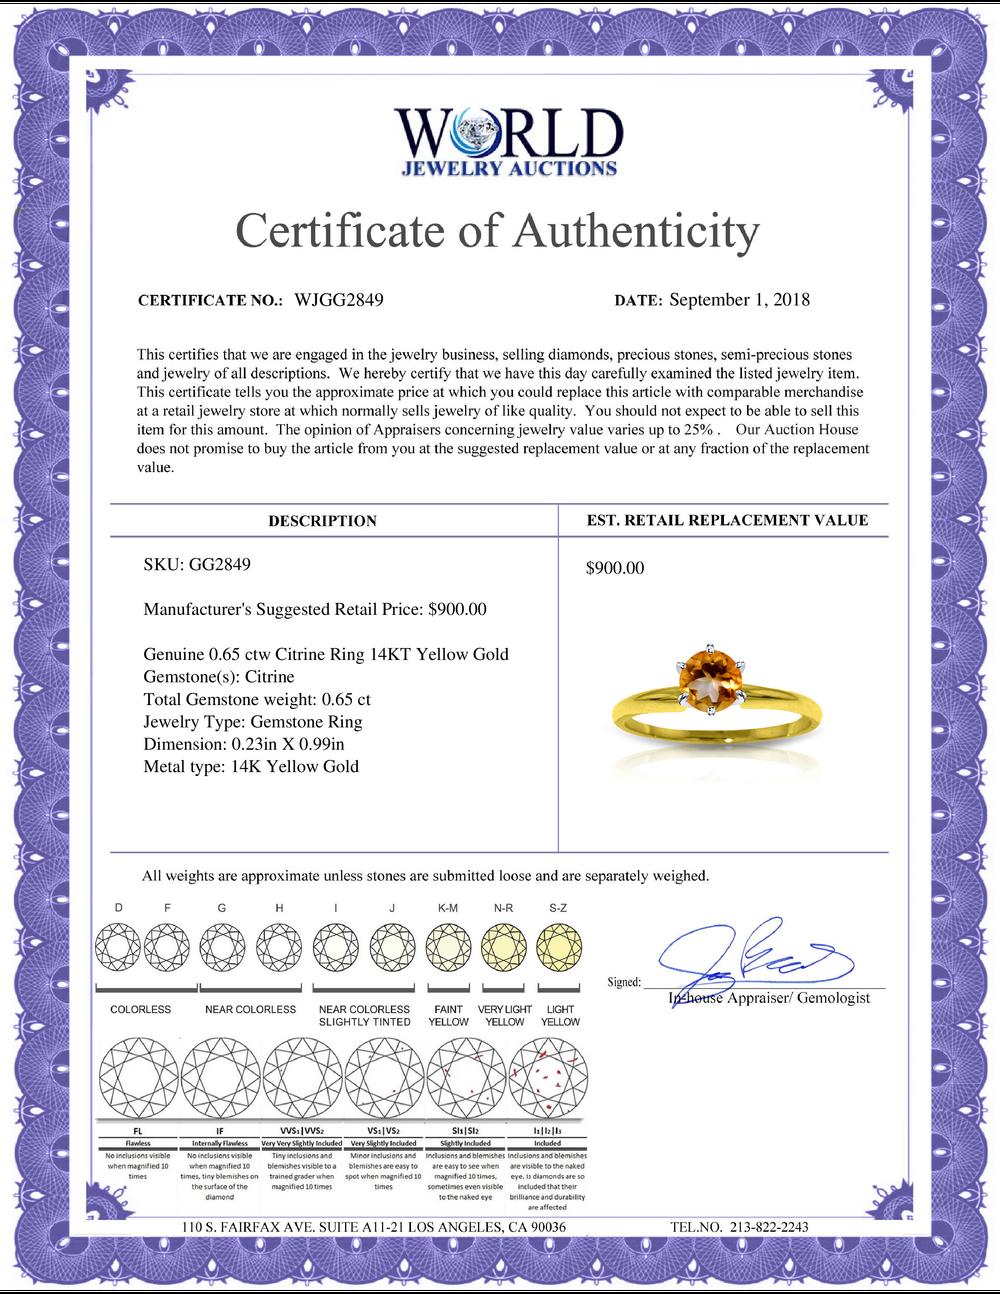 Lot 3024: Genuine 0.65 ctw Citrine Ring Jewelry 14KT Yellow Gold - REF-26V9W